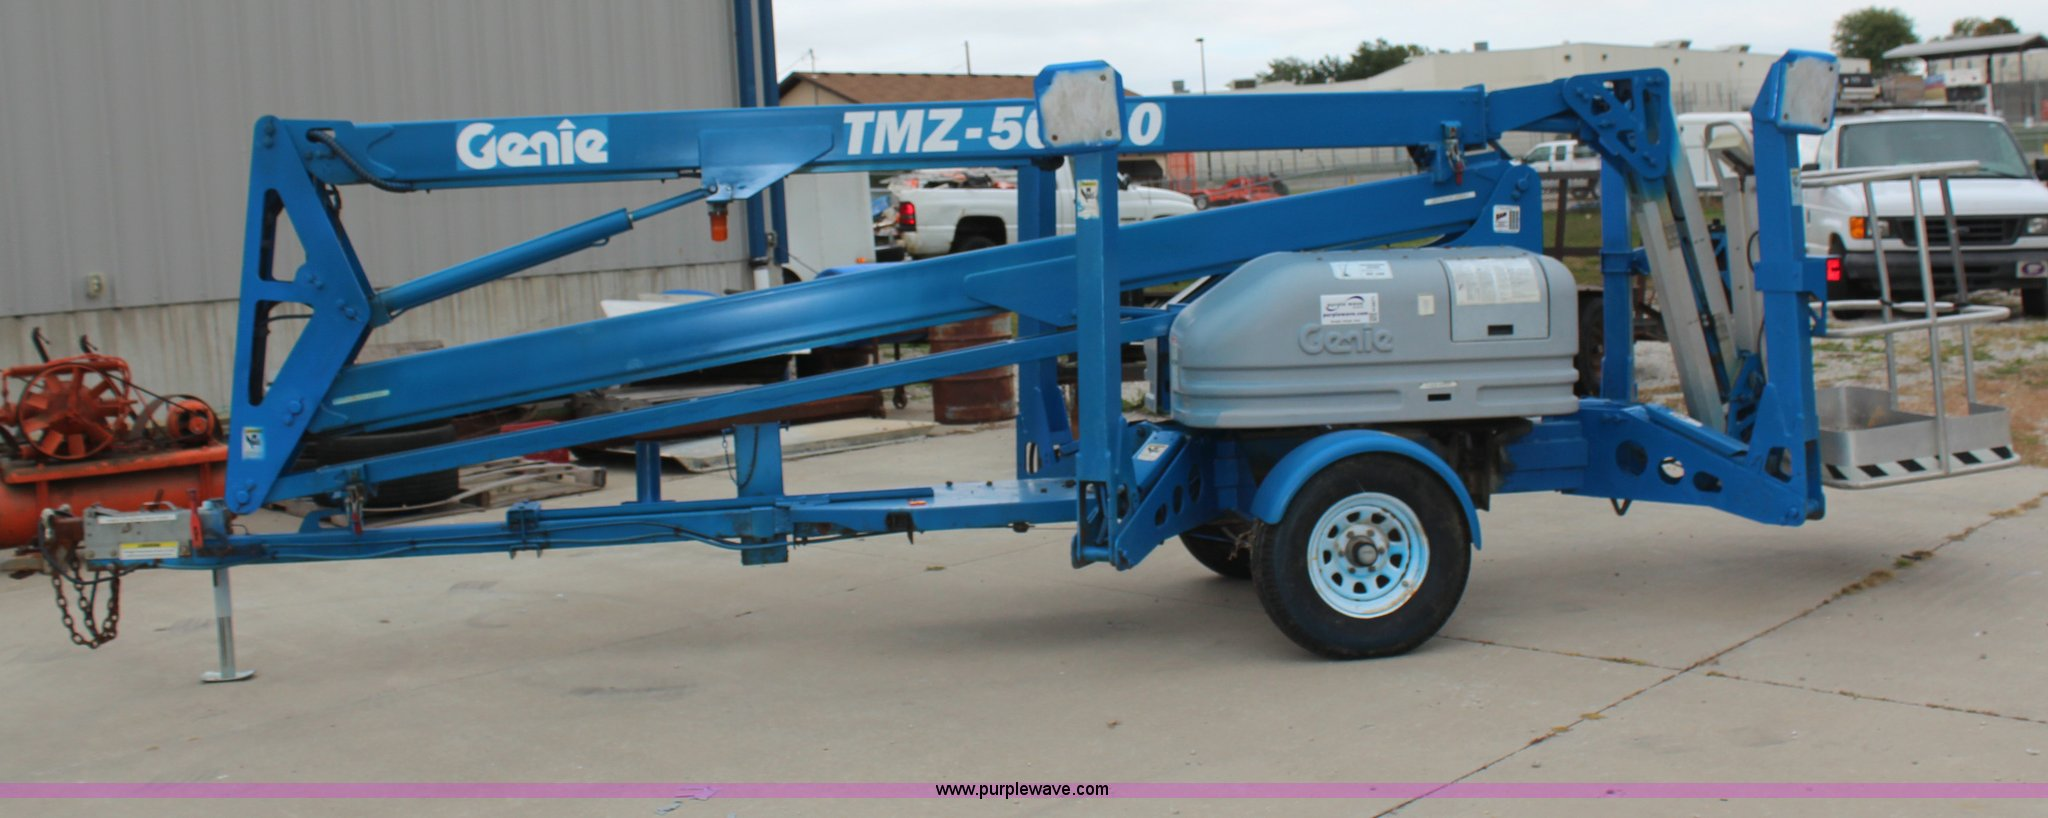 ... Genie TMZ-50\30 towable boom lift Full size in new window ...